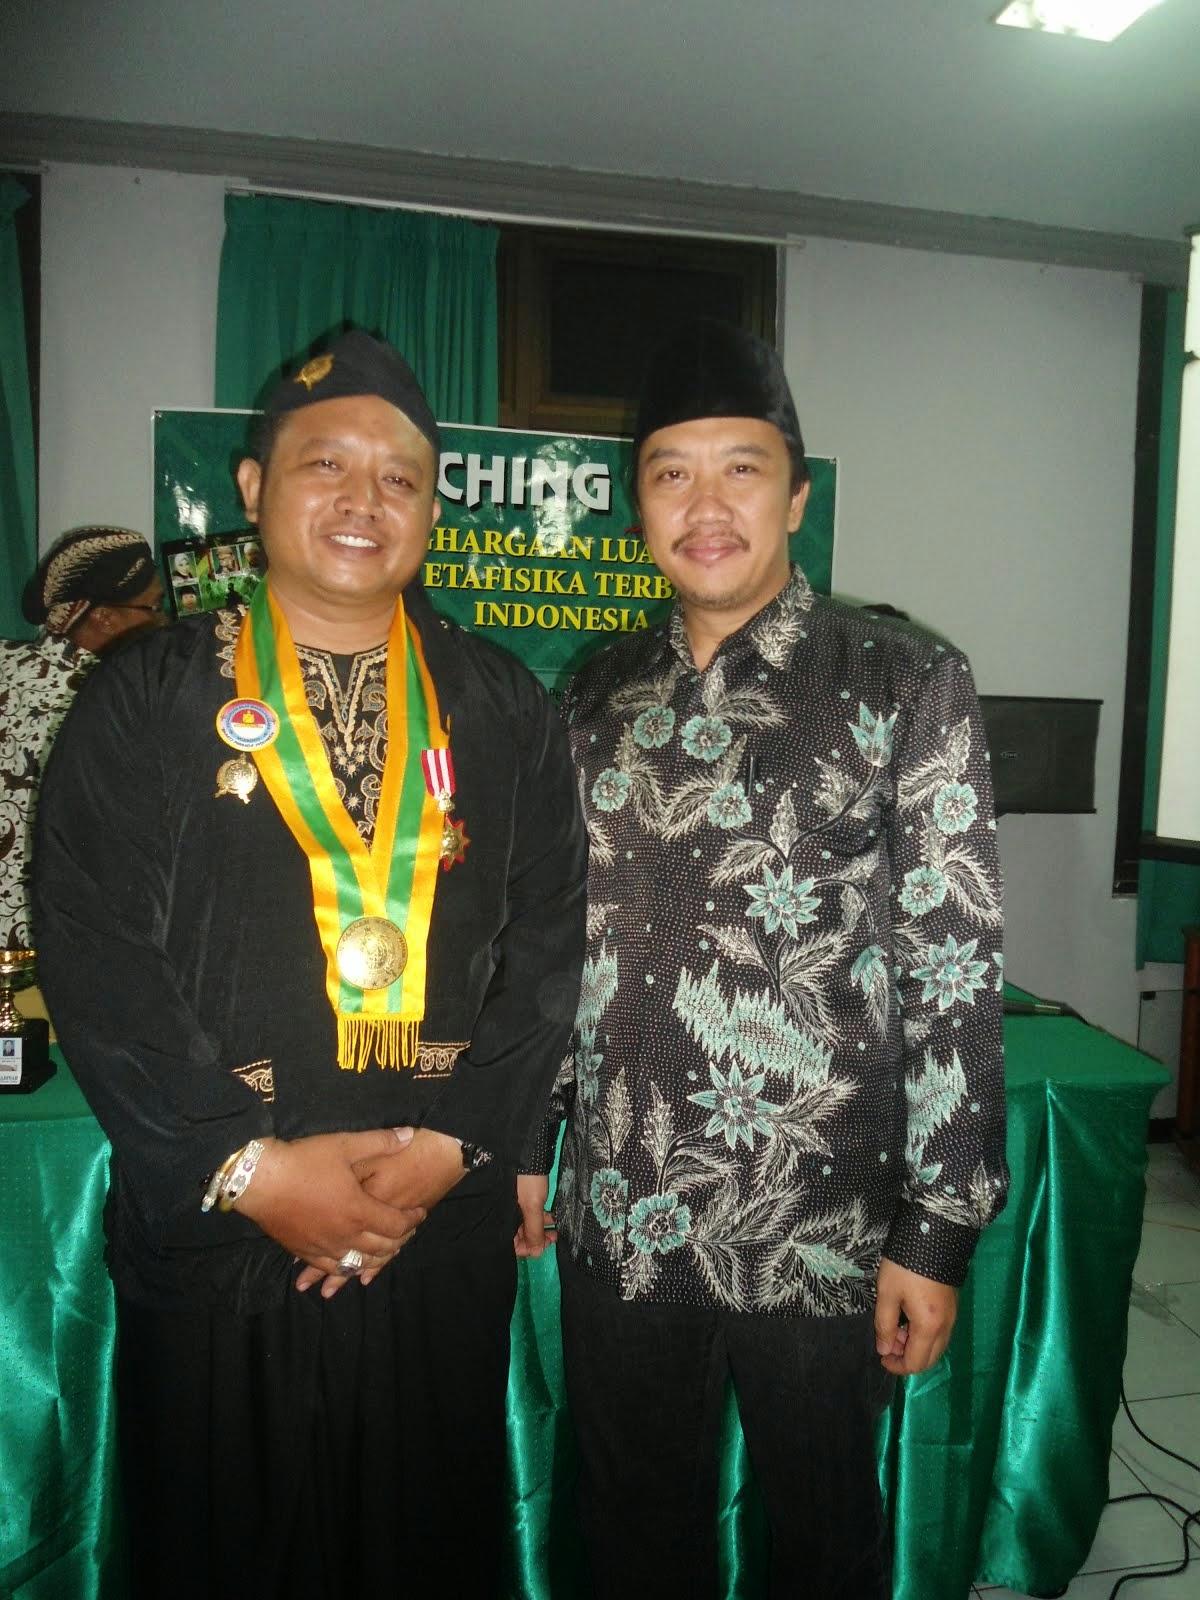 Dari acara  pemberian anugrah metafisikawan terbaik Indonesia oleh penerbit Menara Madinah 2014